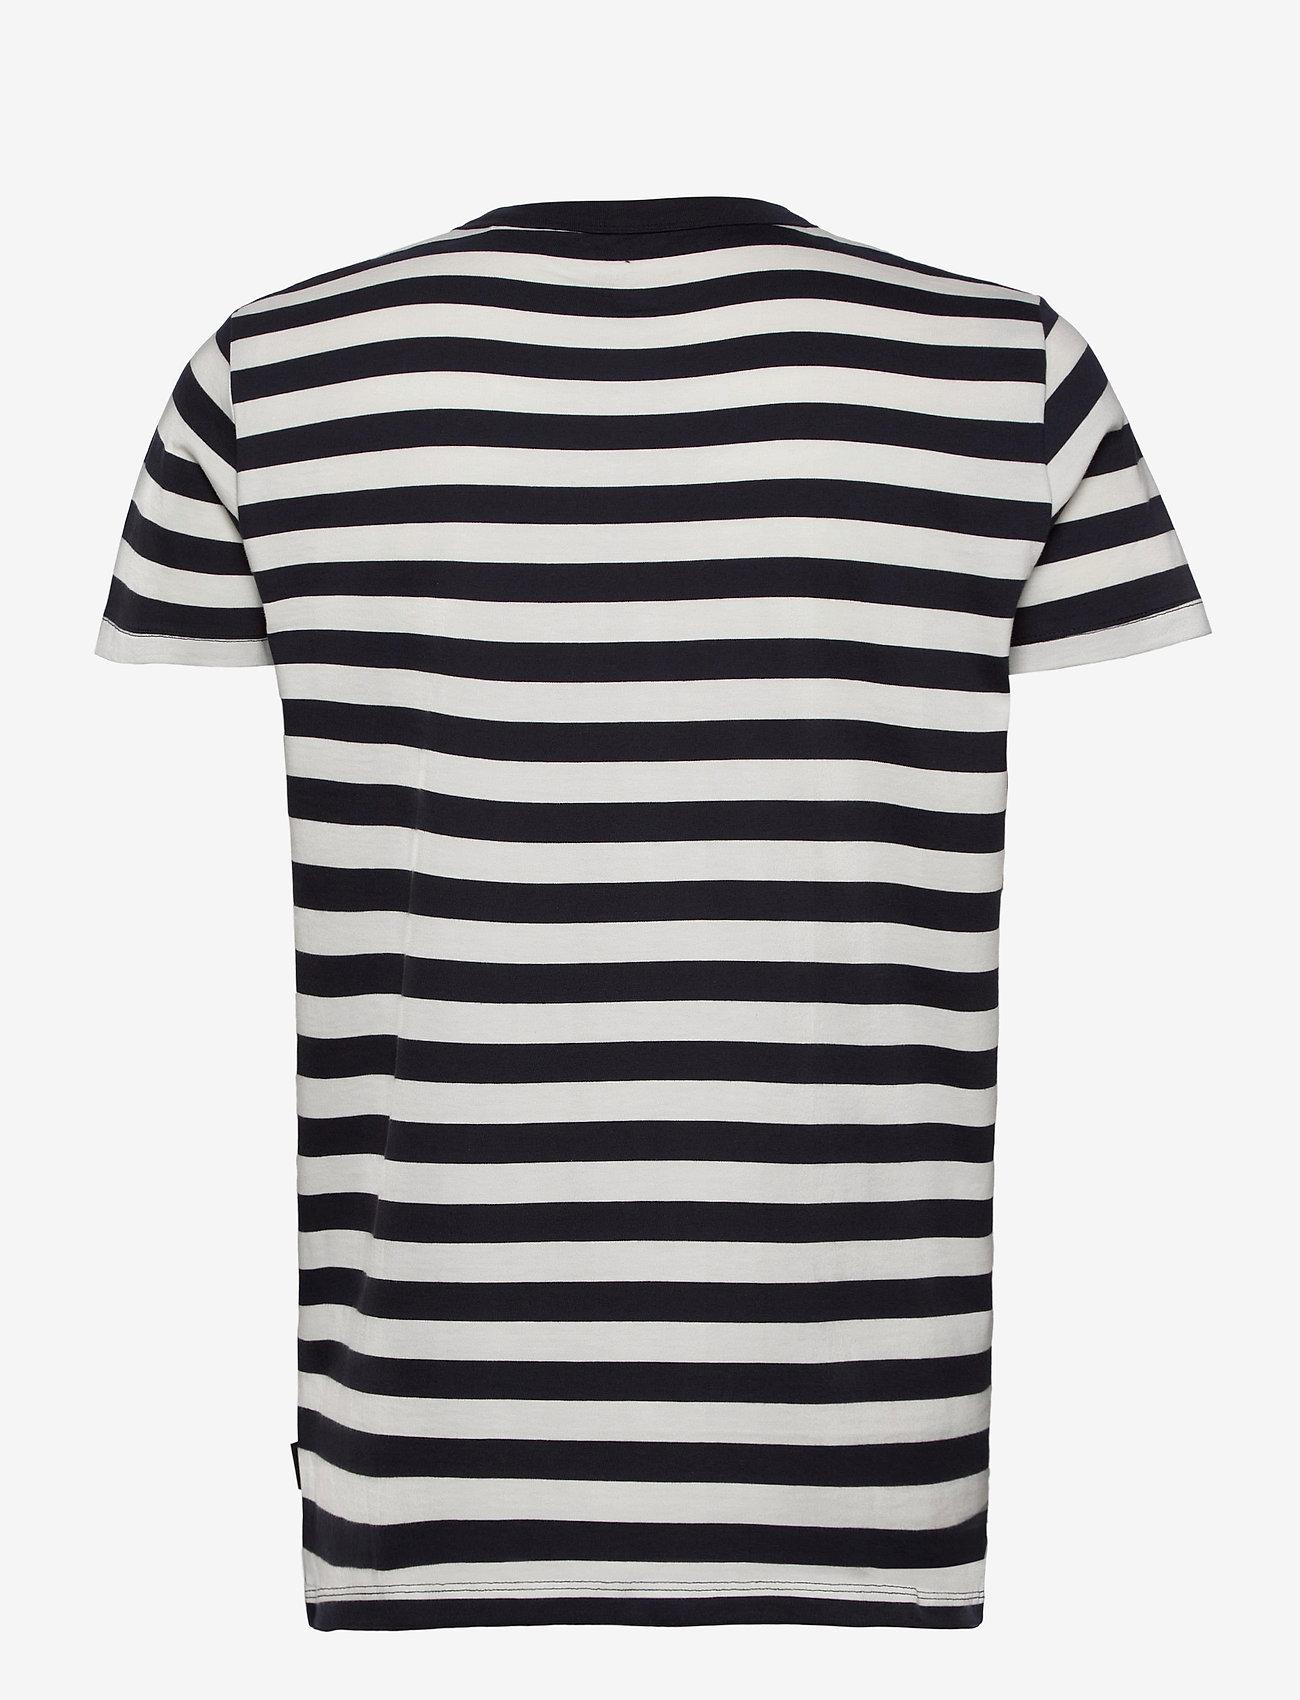 Esprit Casual - T-Shirts - korte mouwen - navy 3 - 1